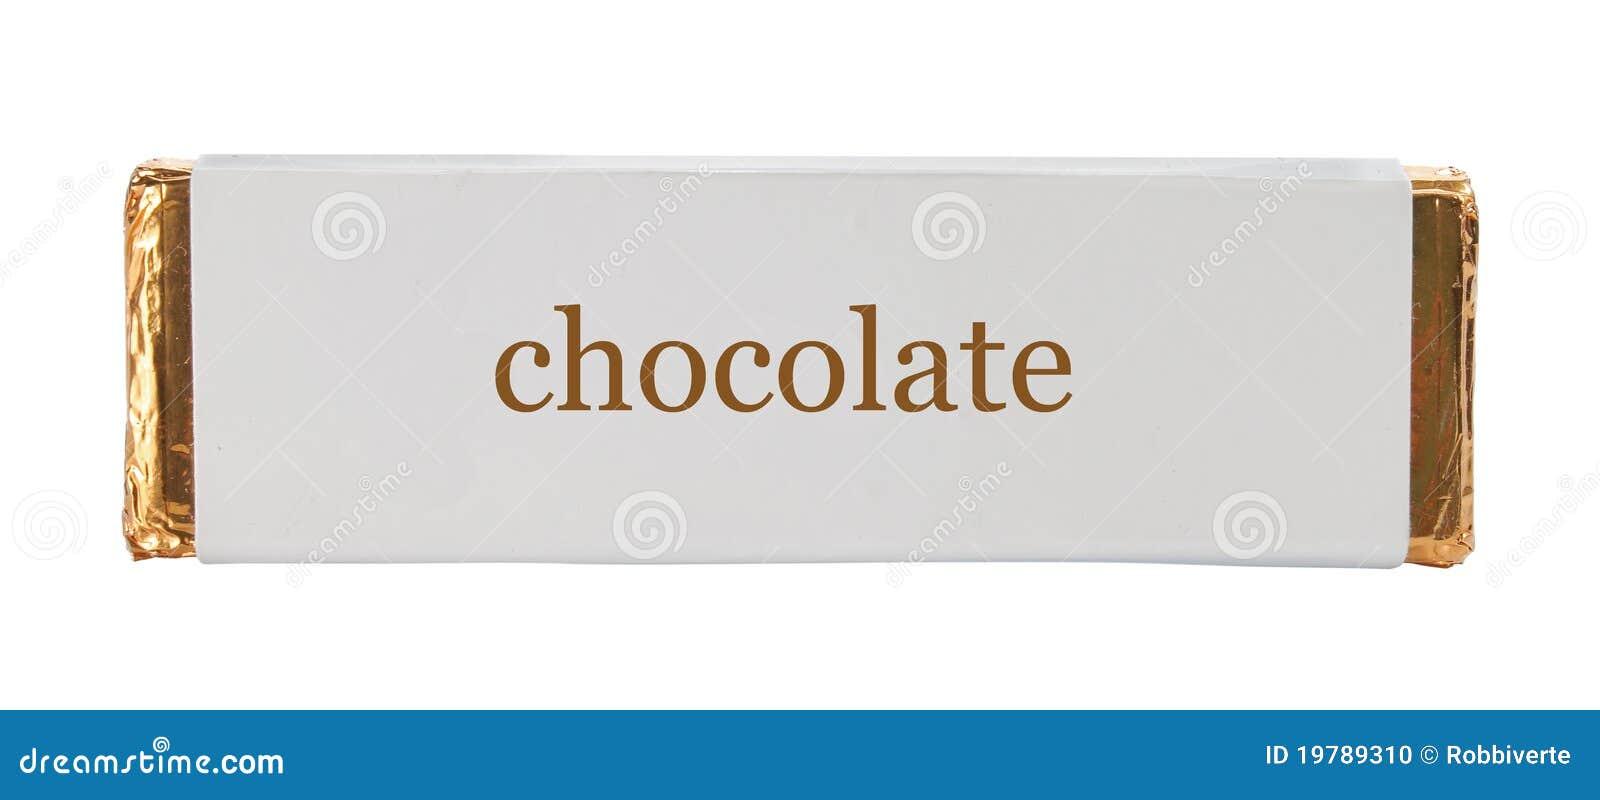 like water chocolate essay food